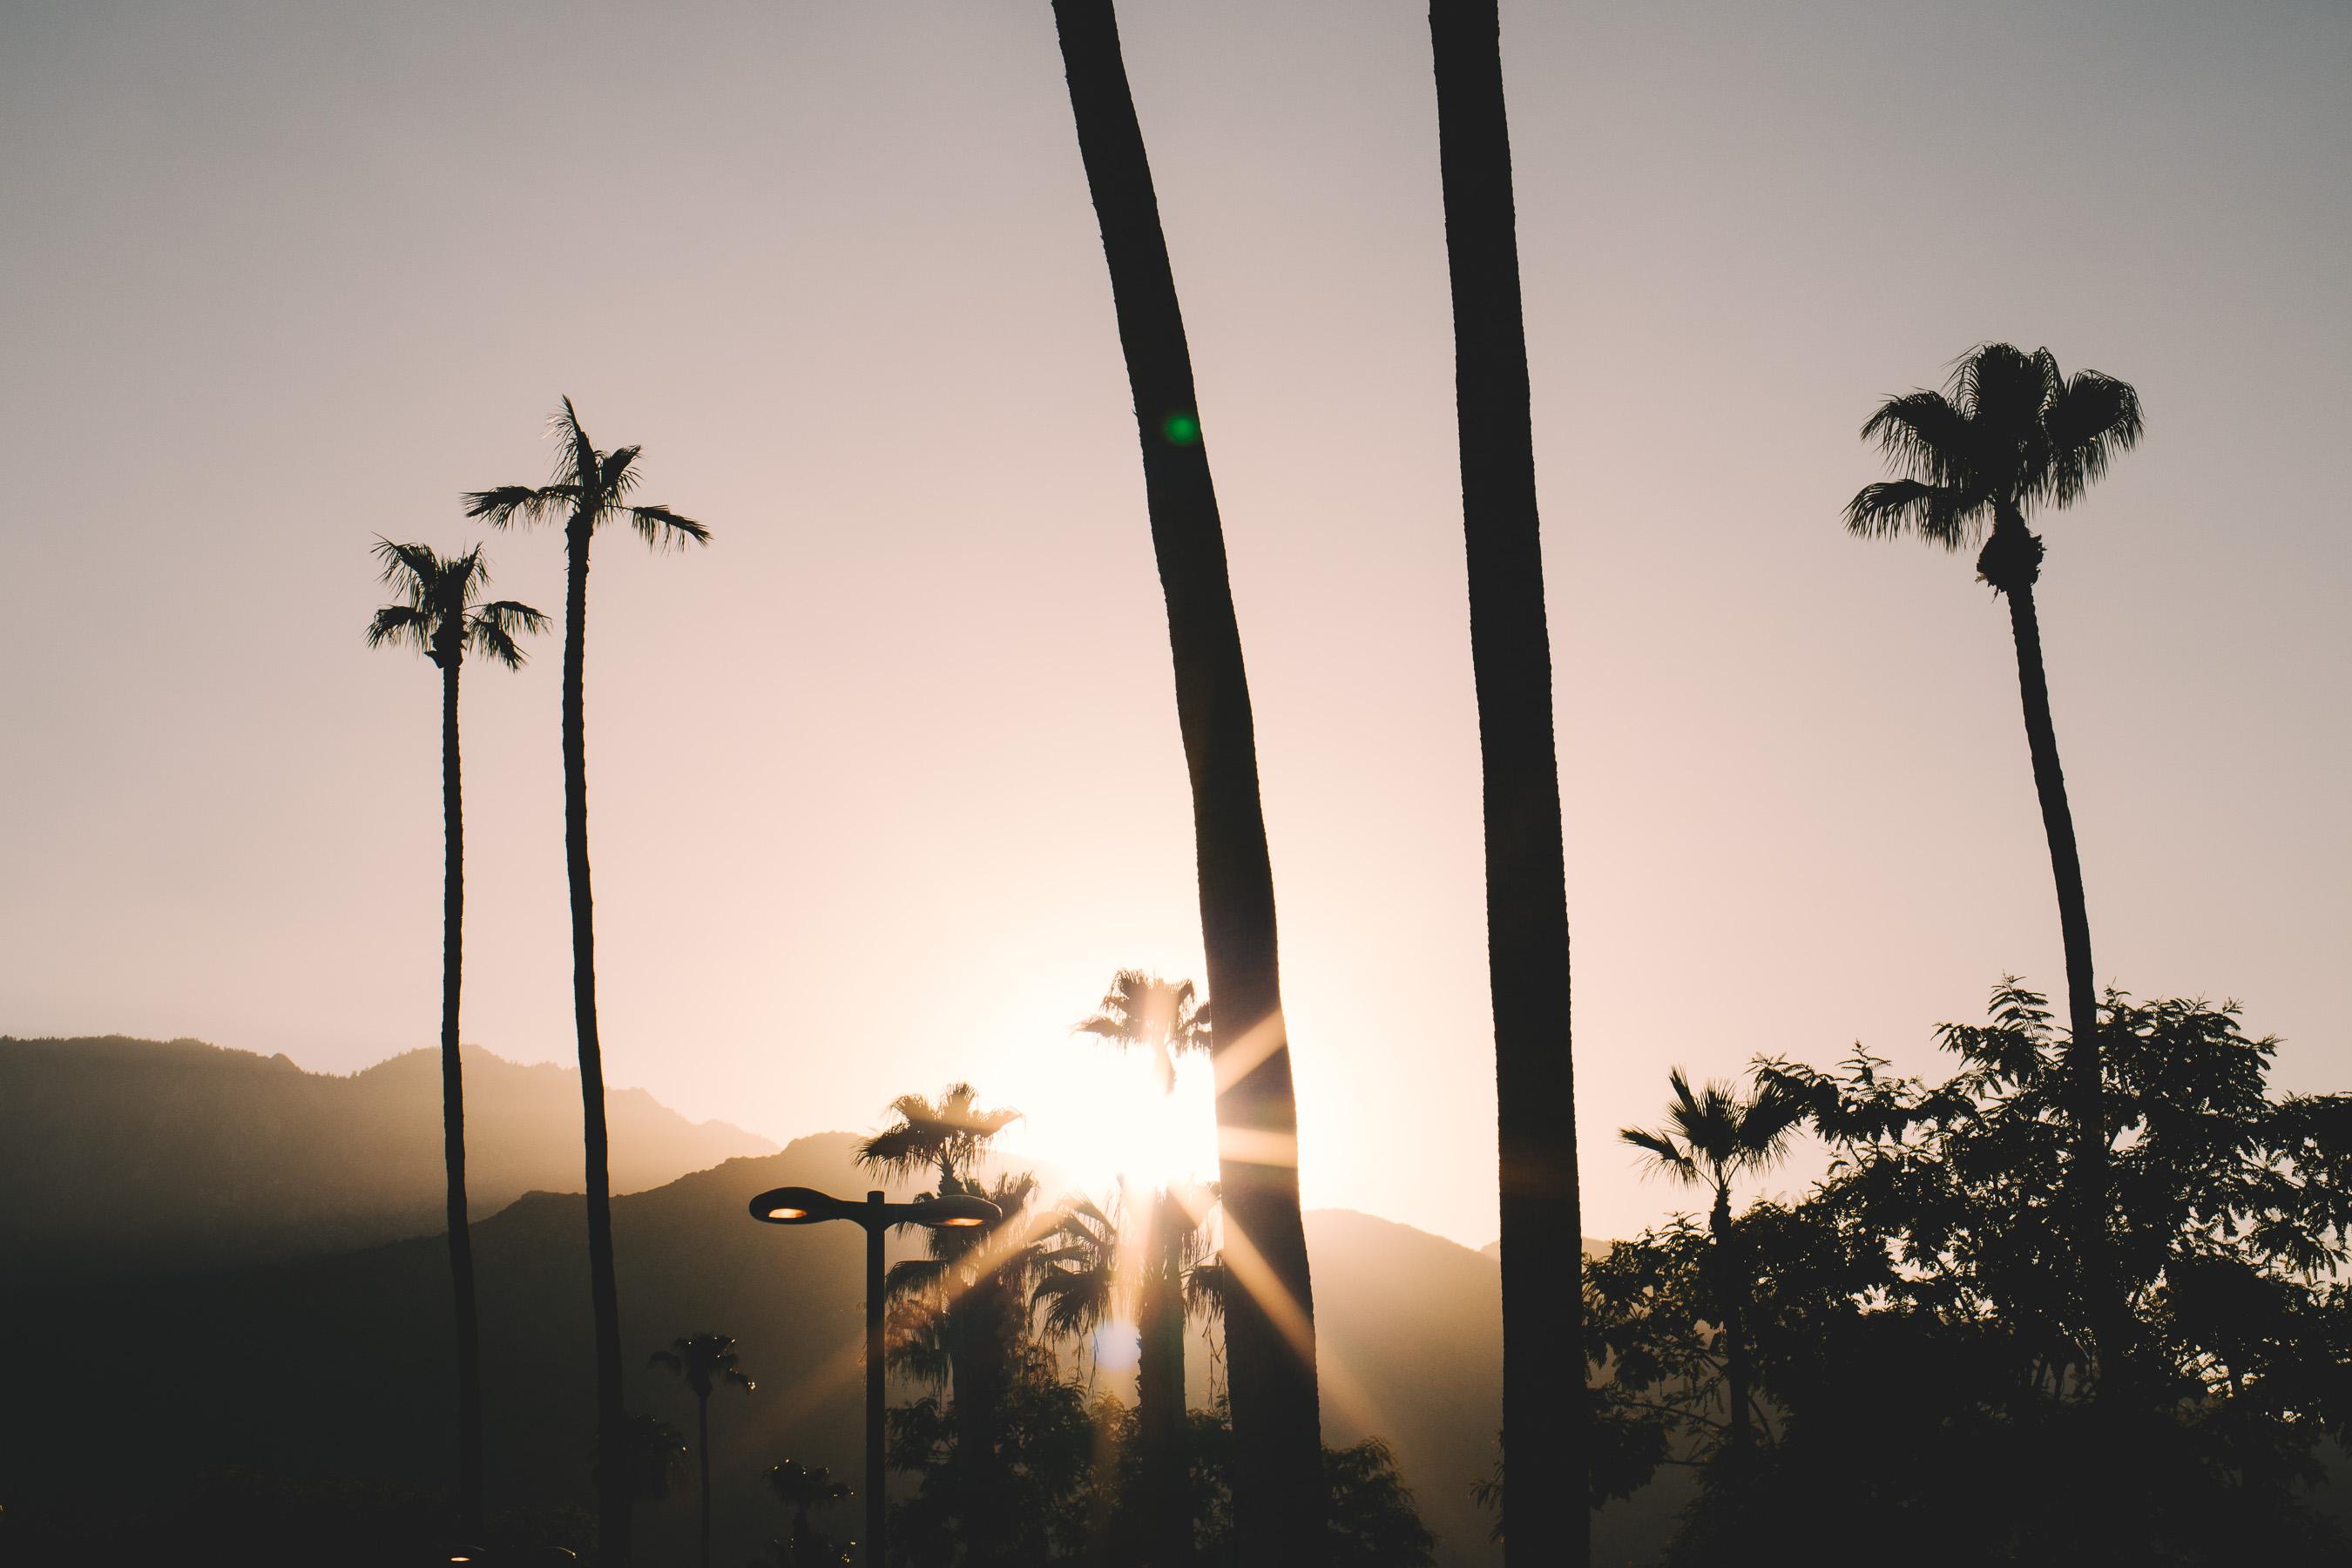 Champagne Twilight Korakia Pensione - Parker Palm Springs